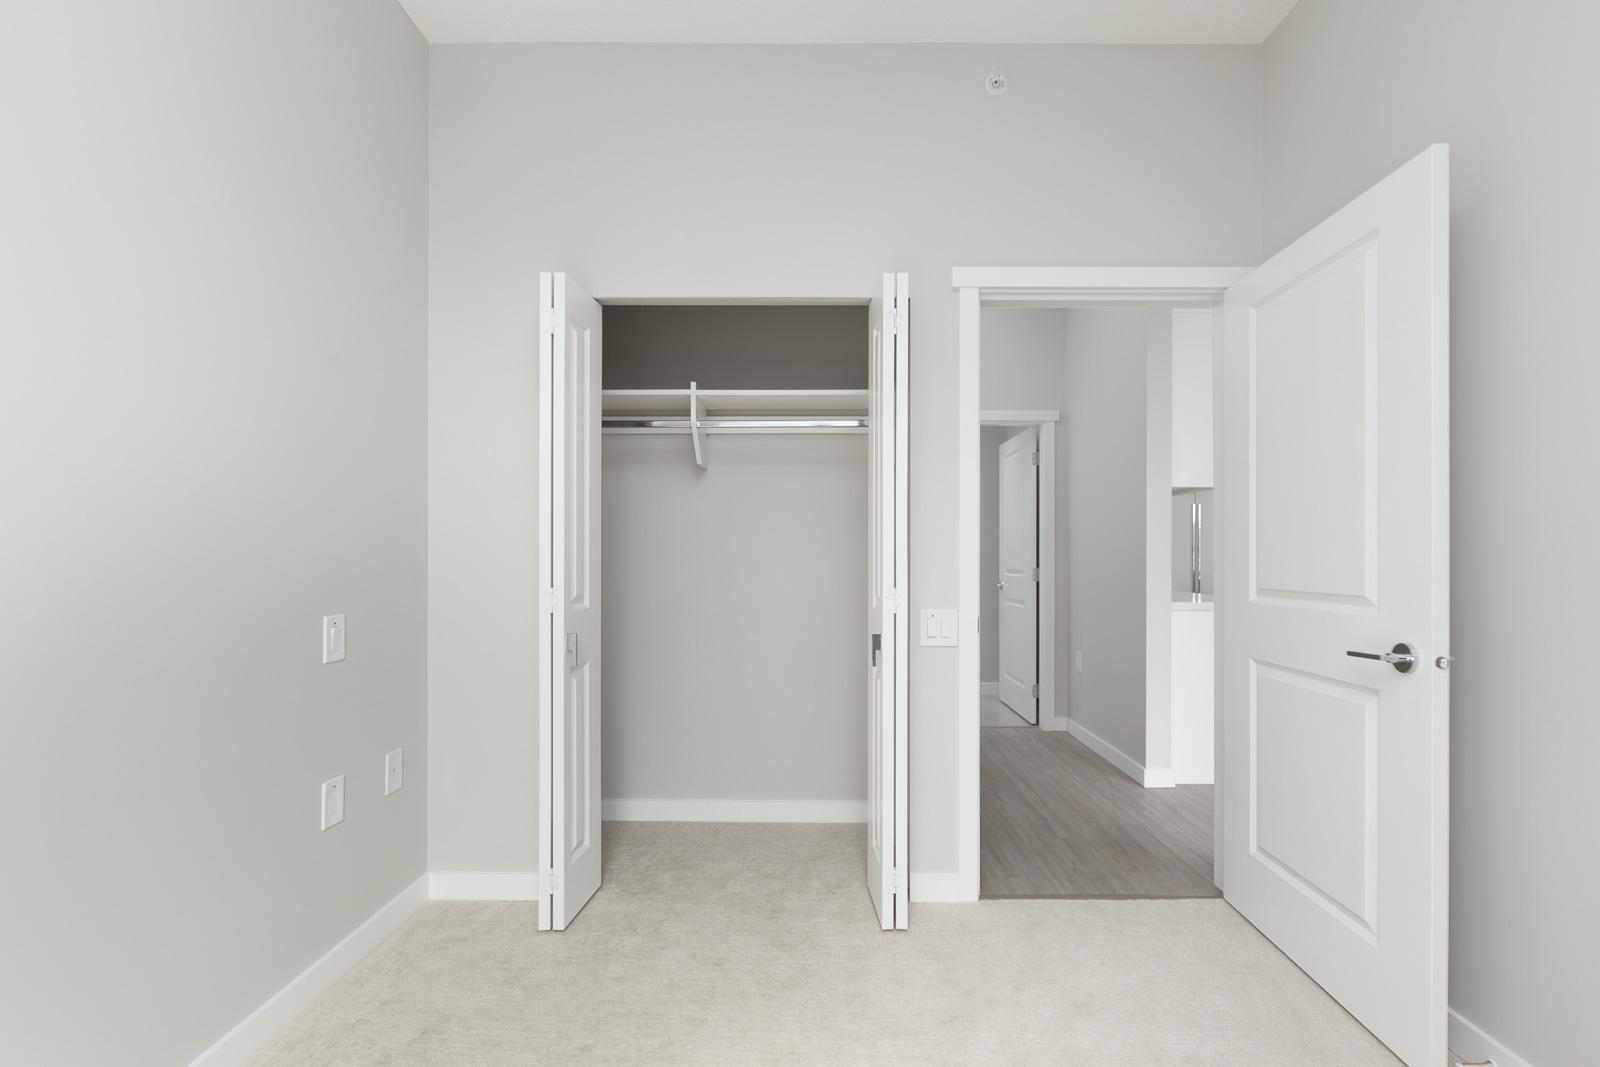 walk in closet in brand in suite managed by Birds Nest Properties